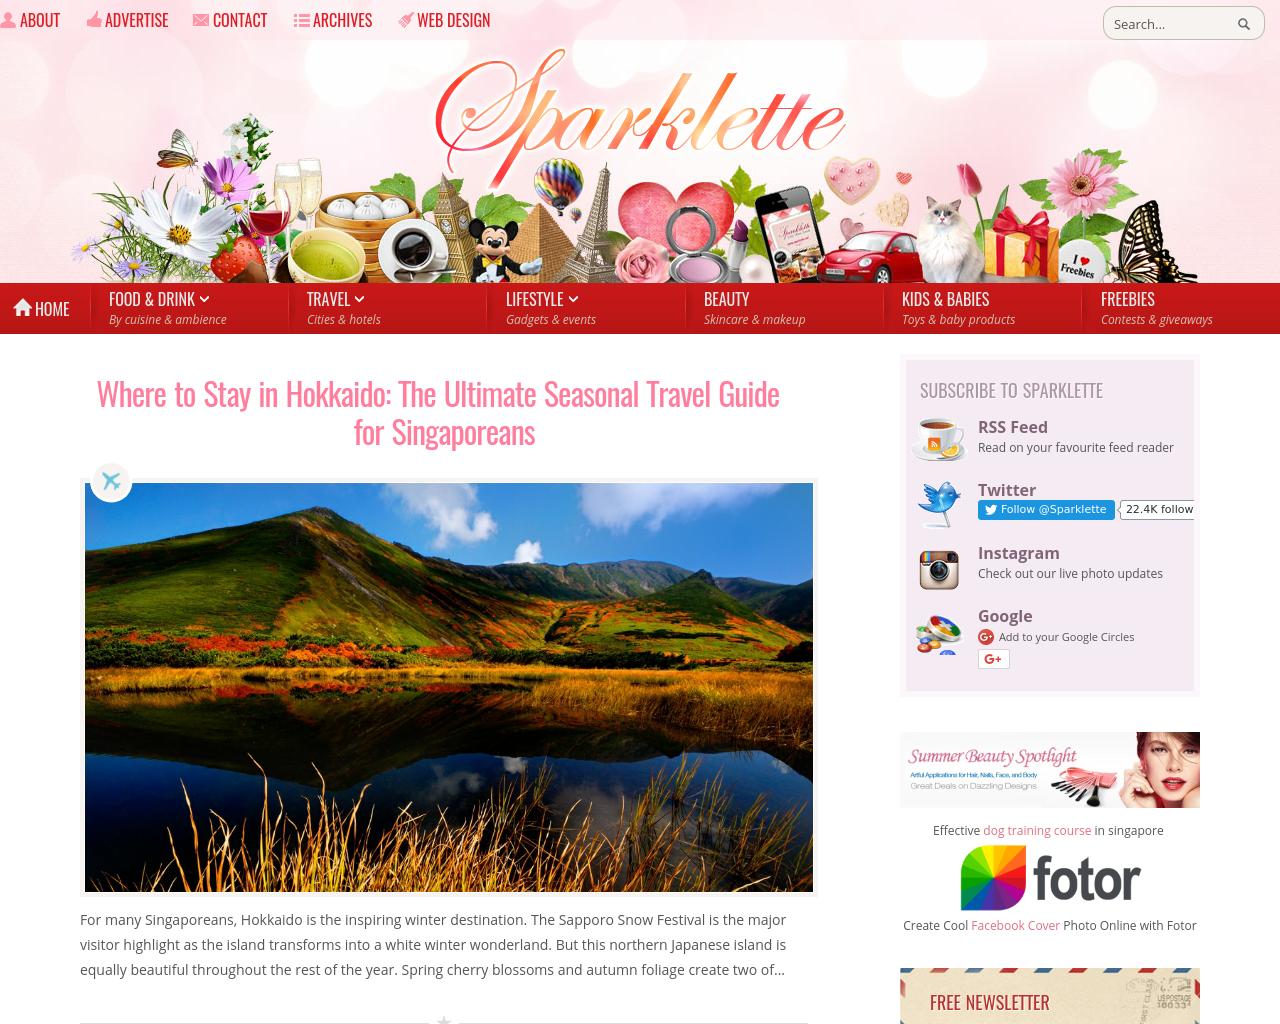 Sparklette-Magazine-Advertising-Reviews-Pricing